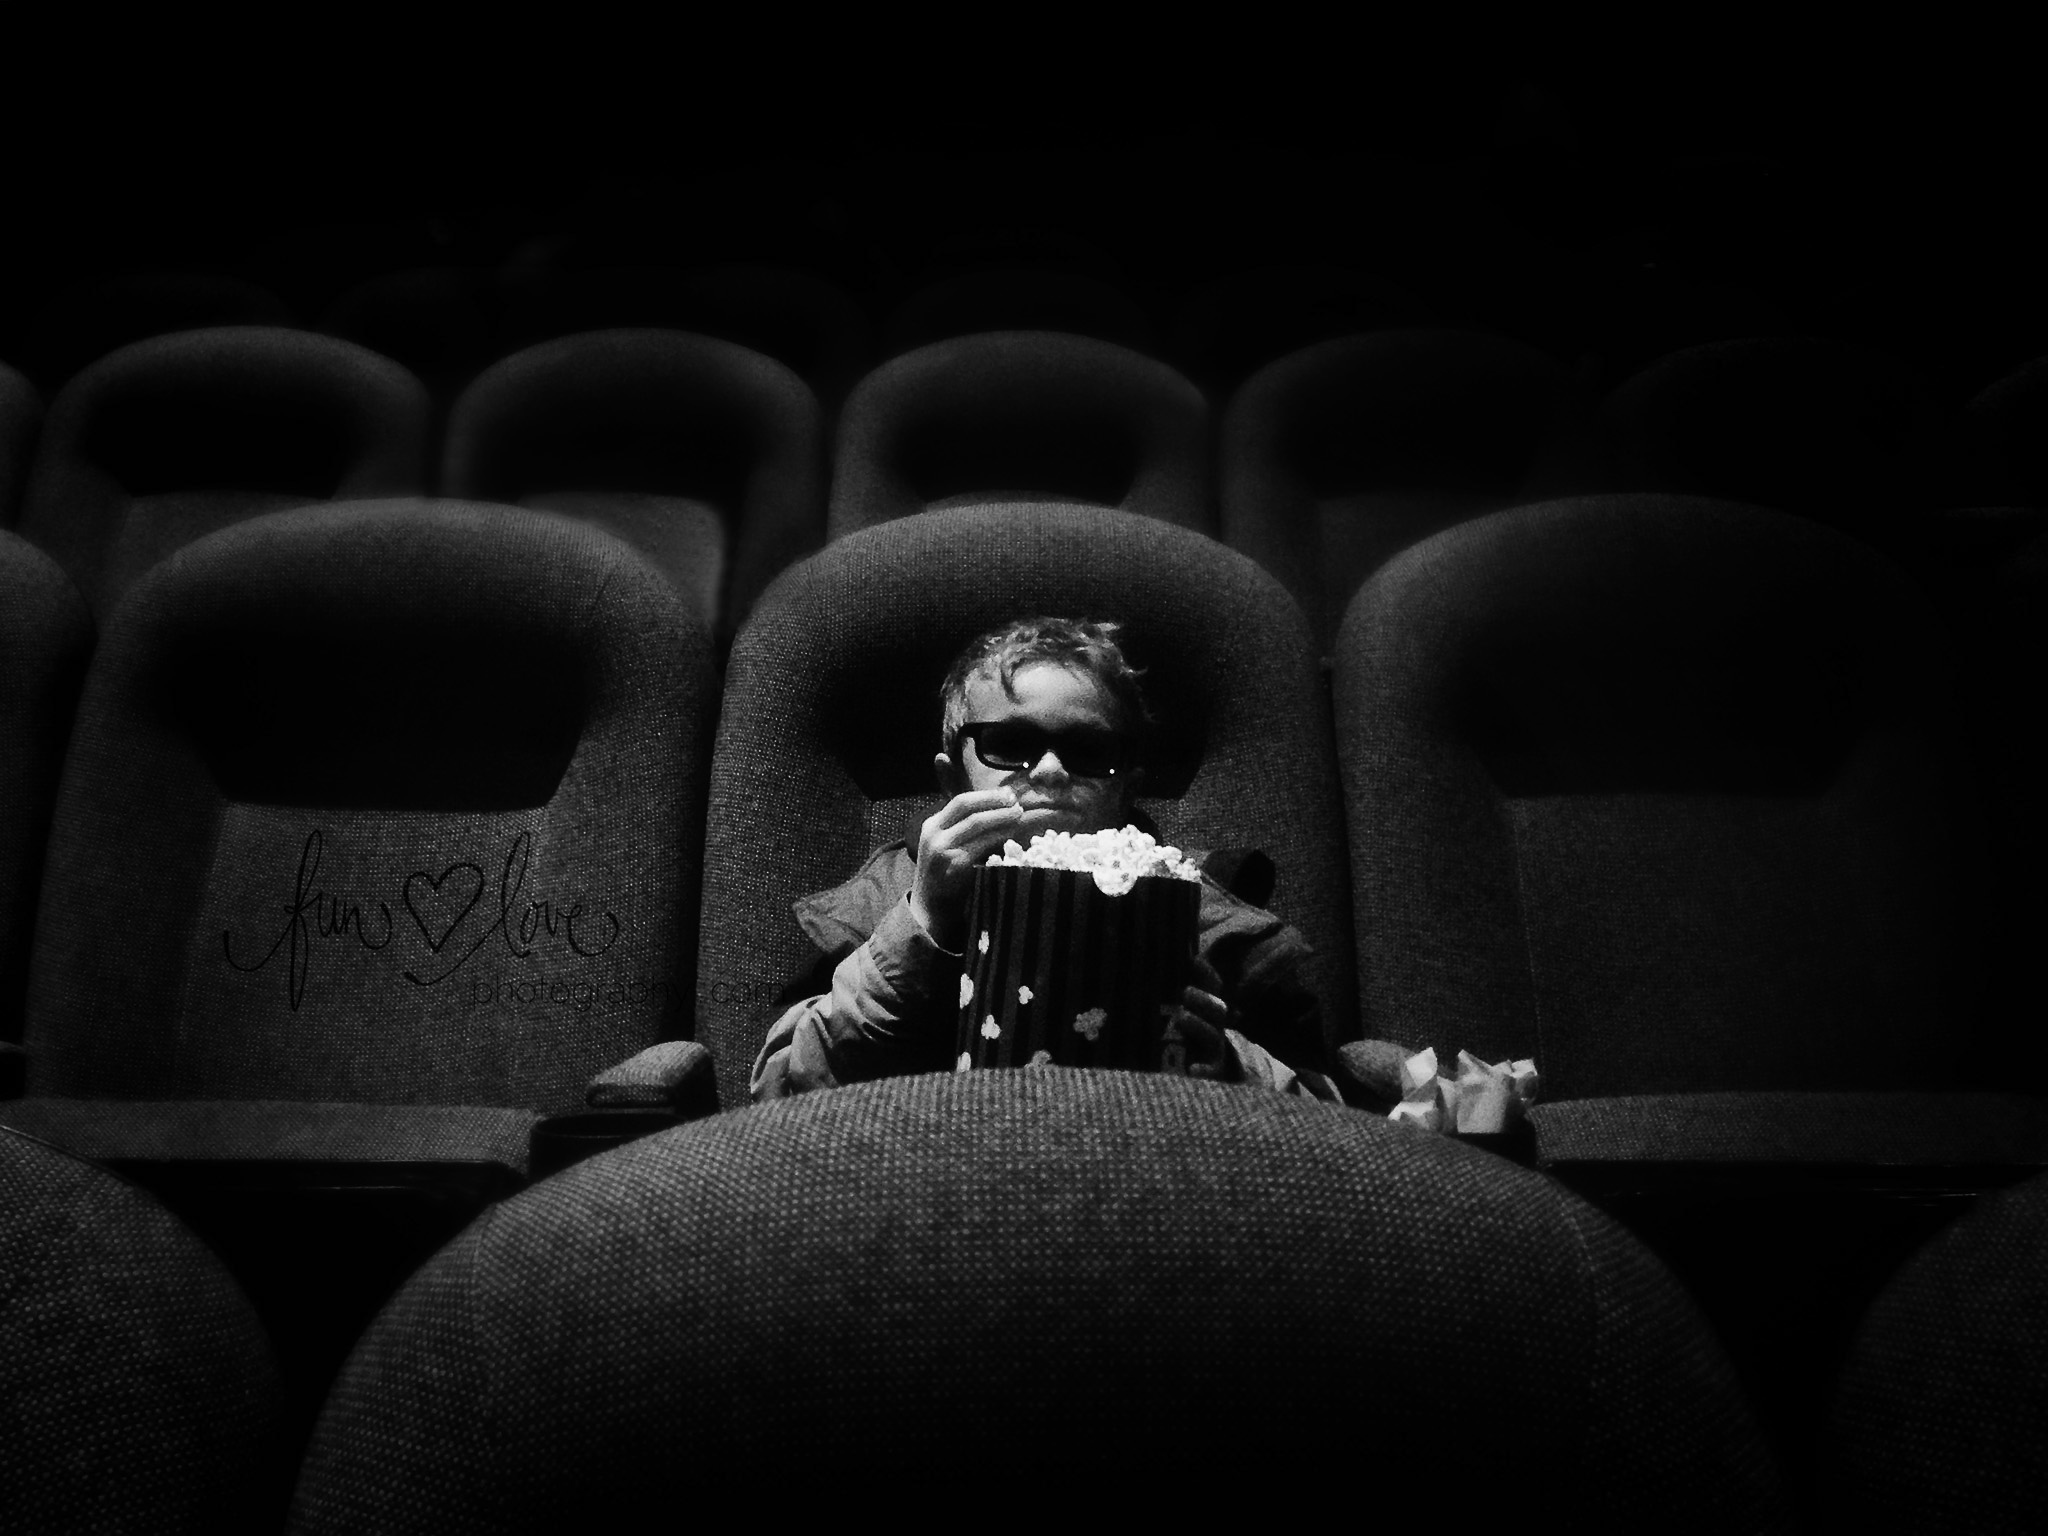 boy at a 3-D movie eating popcorn